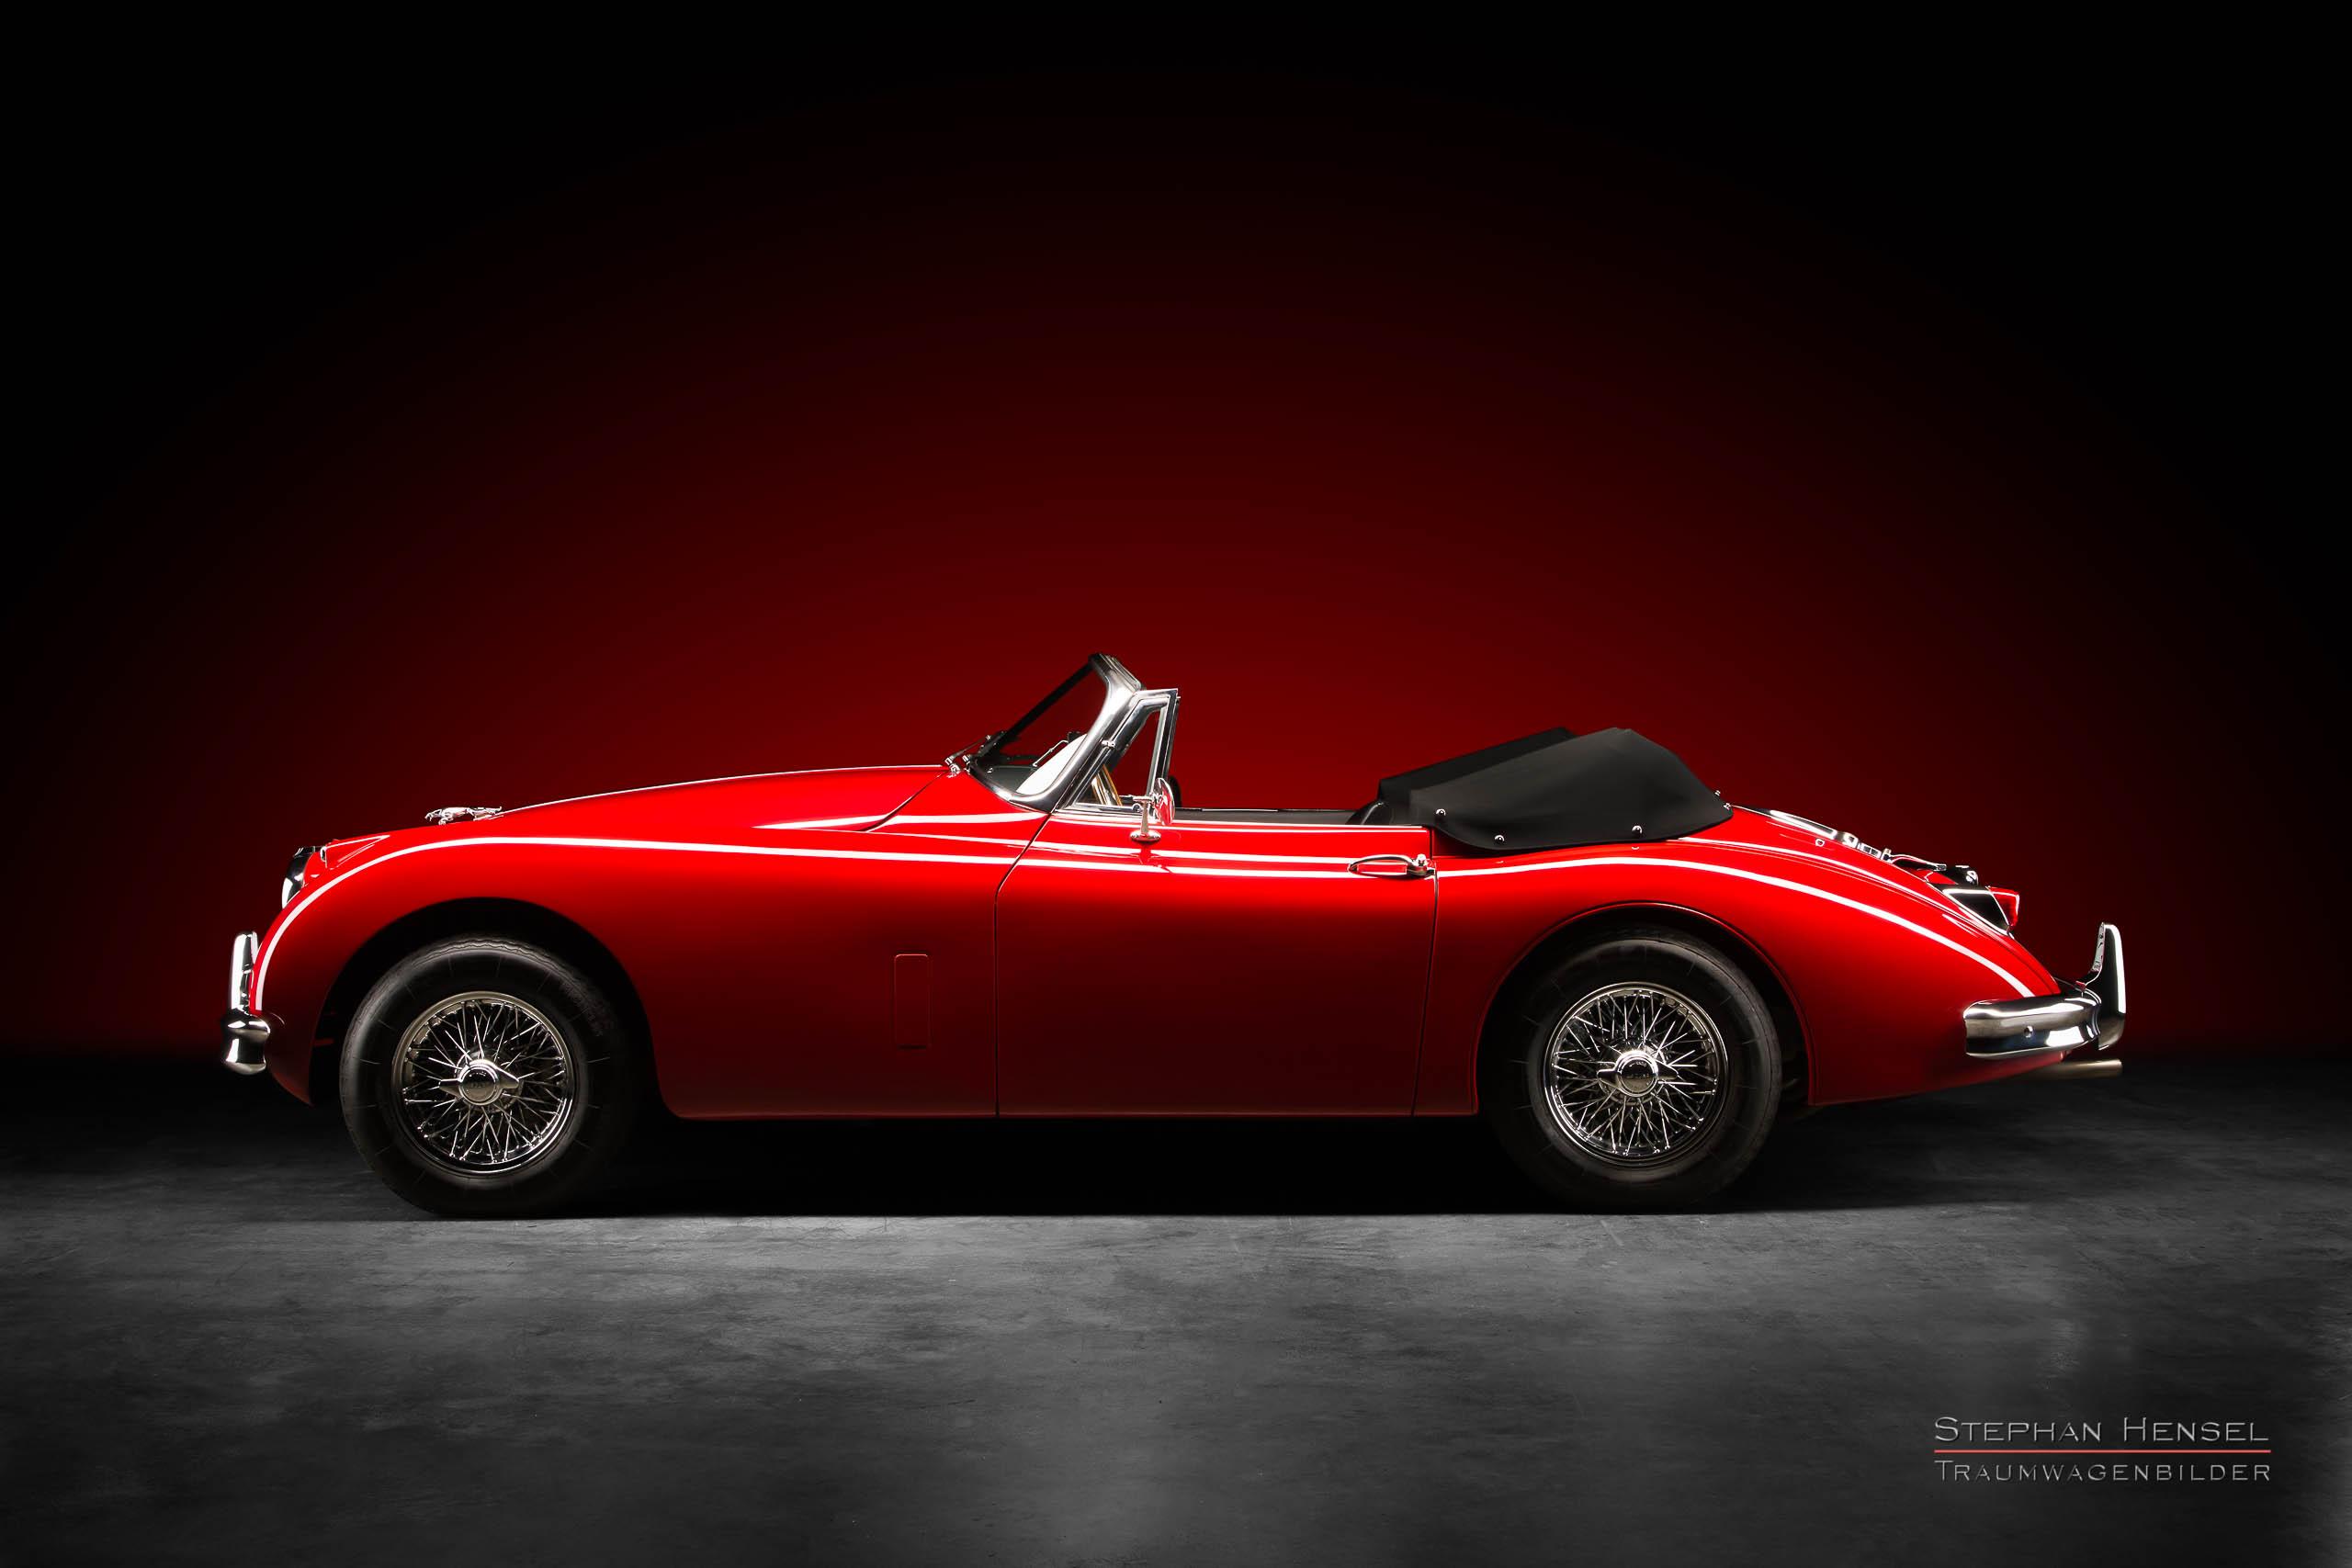 Jaguar XK 150 DHC, 1958, Seitenansicht, Autofotograf, Hamburg, Automobilfotograf, Oldtimerfotograf, Oldtimerfotografie, Car Photography, Stephan Hensel